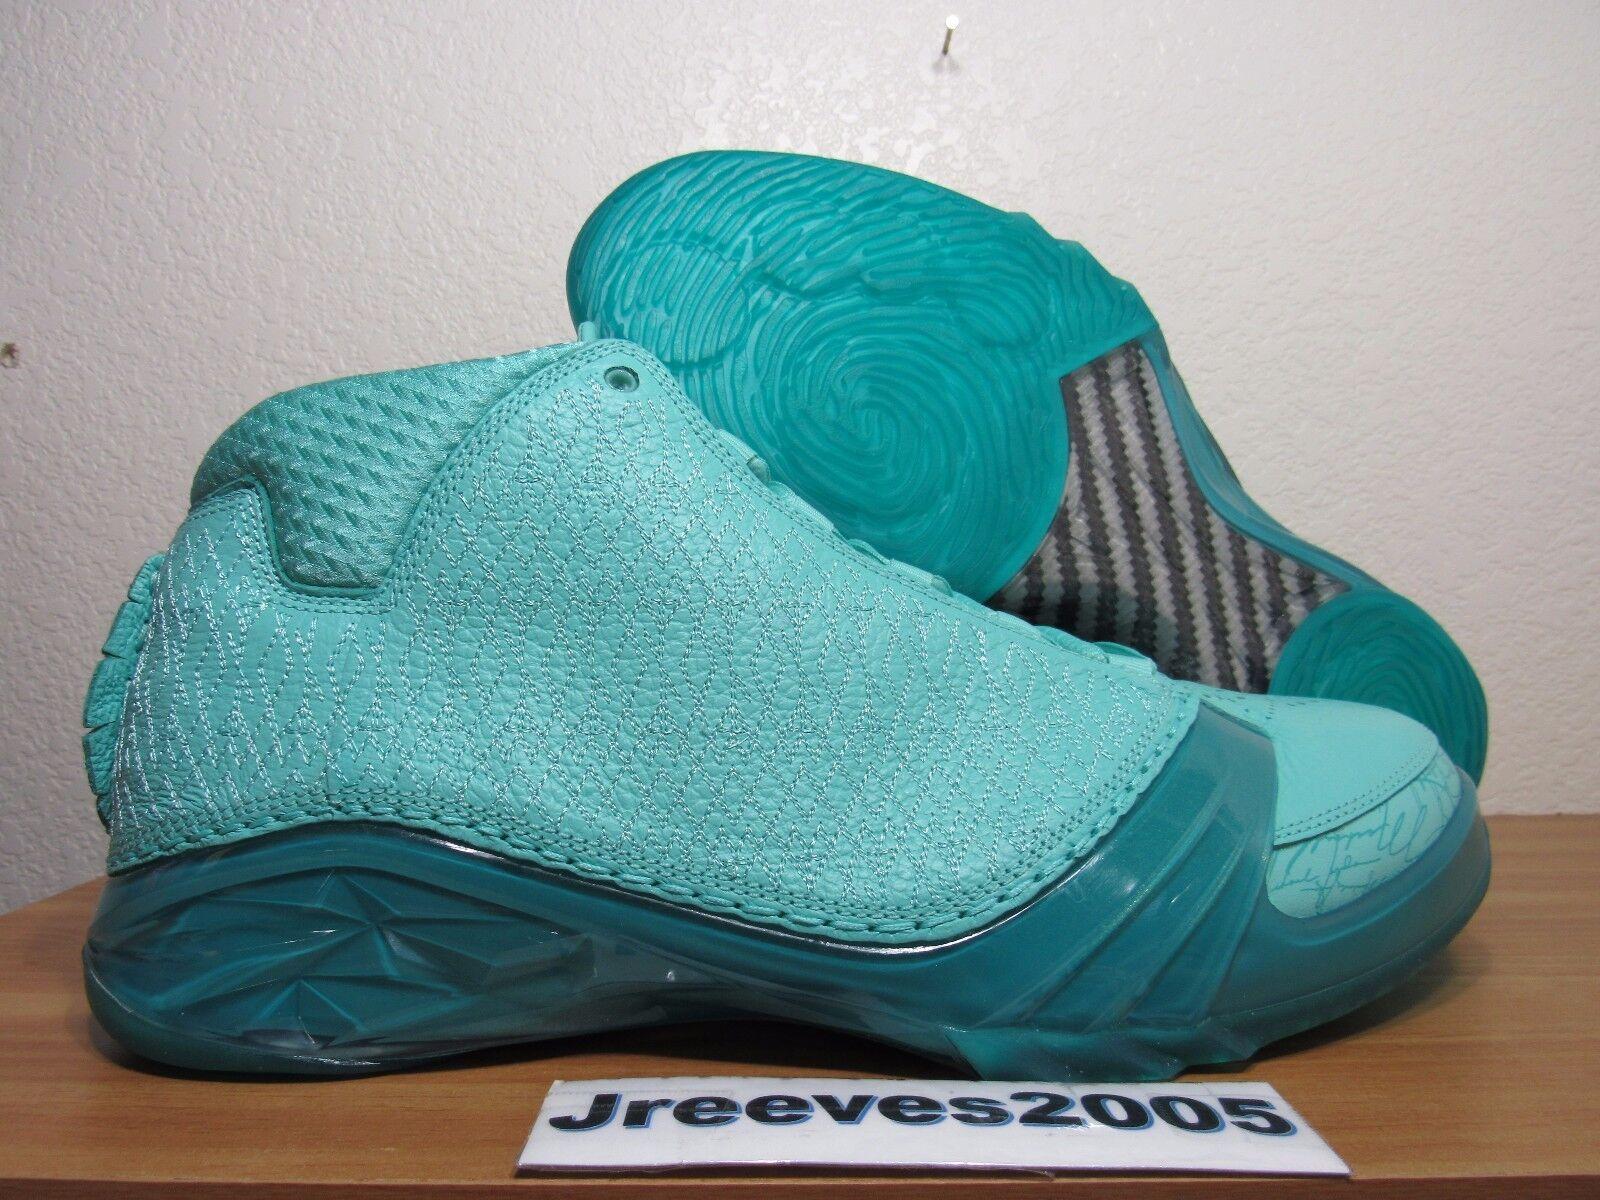 DS Jordan XX3 SOLEFLY  766 1500 Sz 11.5 100% Authentic Retro Marlins 887230 332